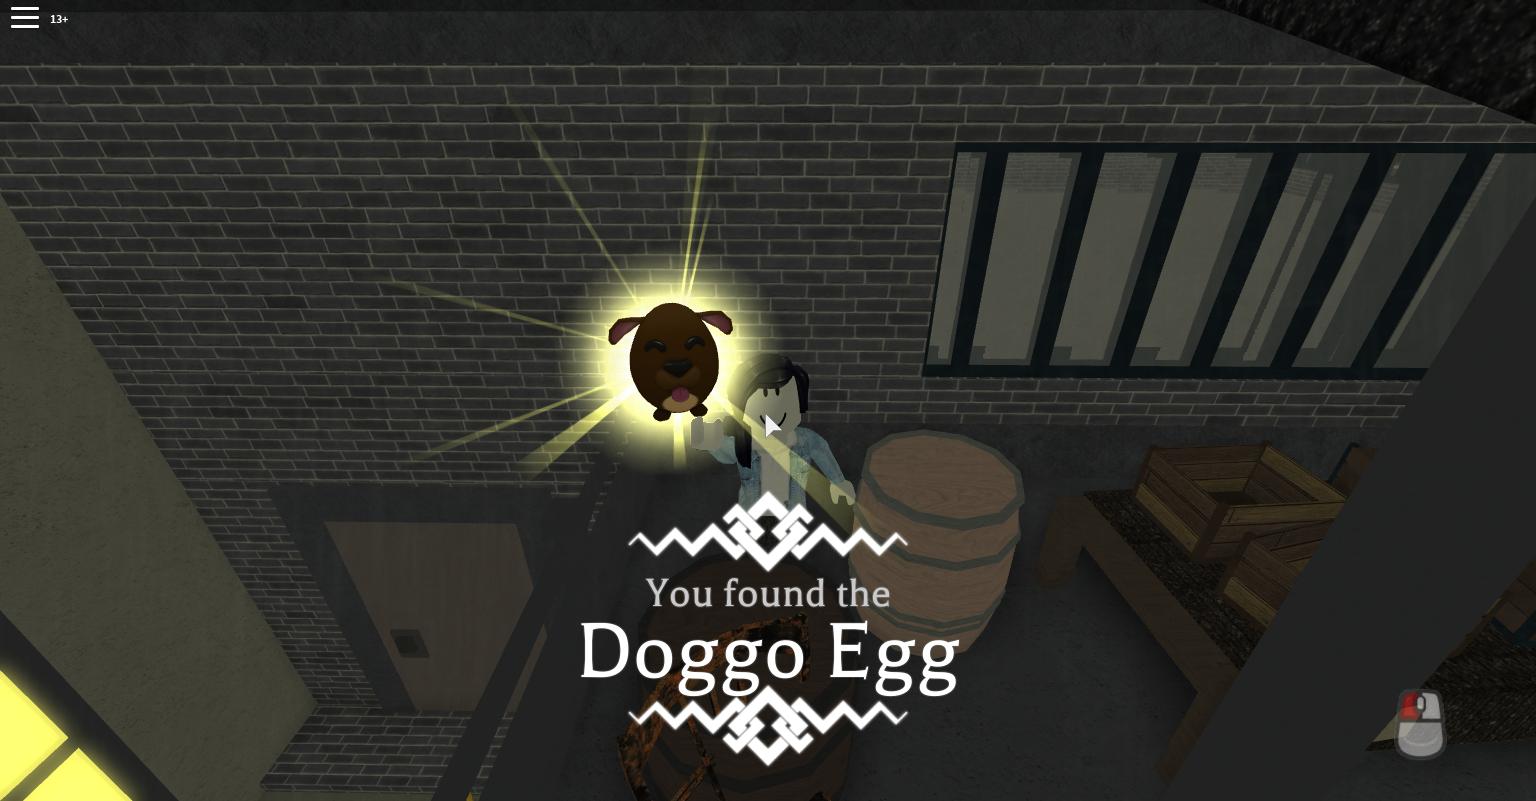 Roblox Egg Hunt 2018 Festival Aveyn S Blog Roblox Egg Hunt 2018 How To Find All The Eggs In Hardboiled City